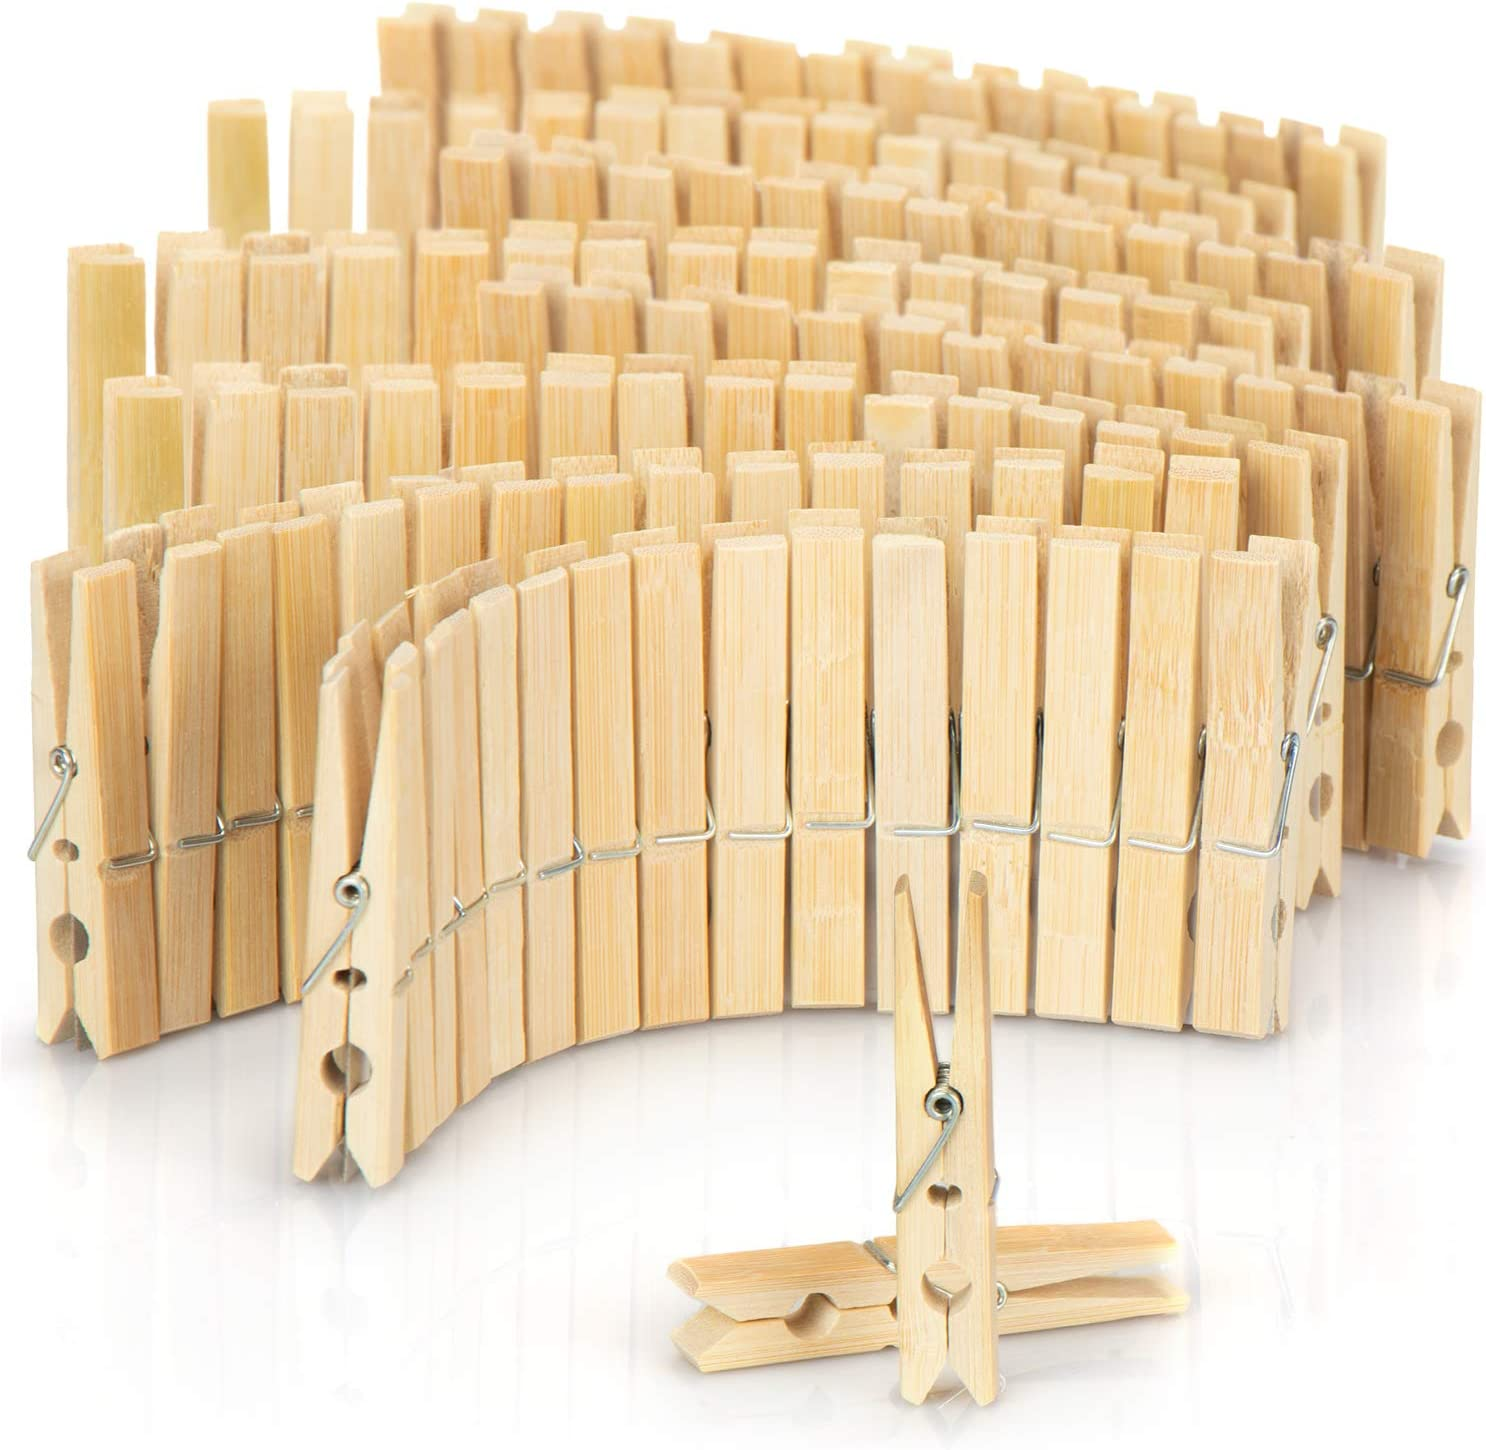 120 pieces - bamboo com-four/® 120x Clothes pegs made of wood wooden pegs made of bamboo Clamps for hanging clothes